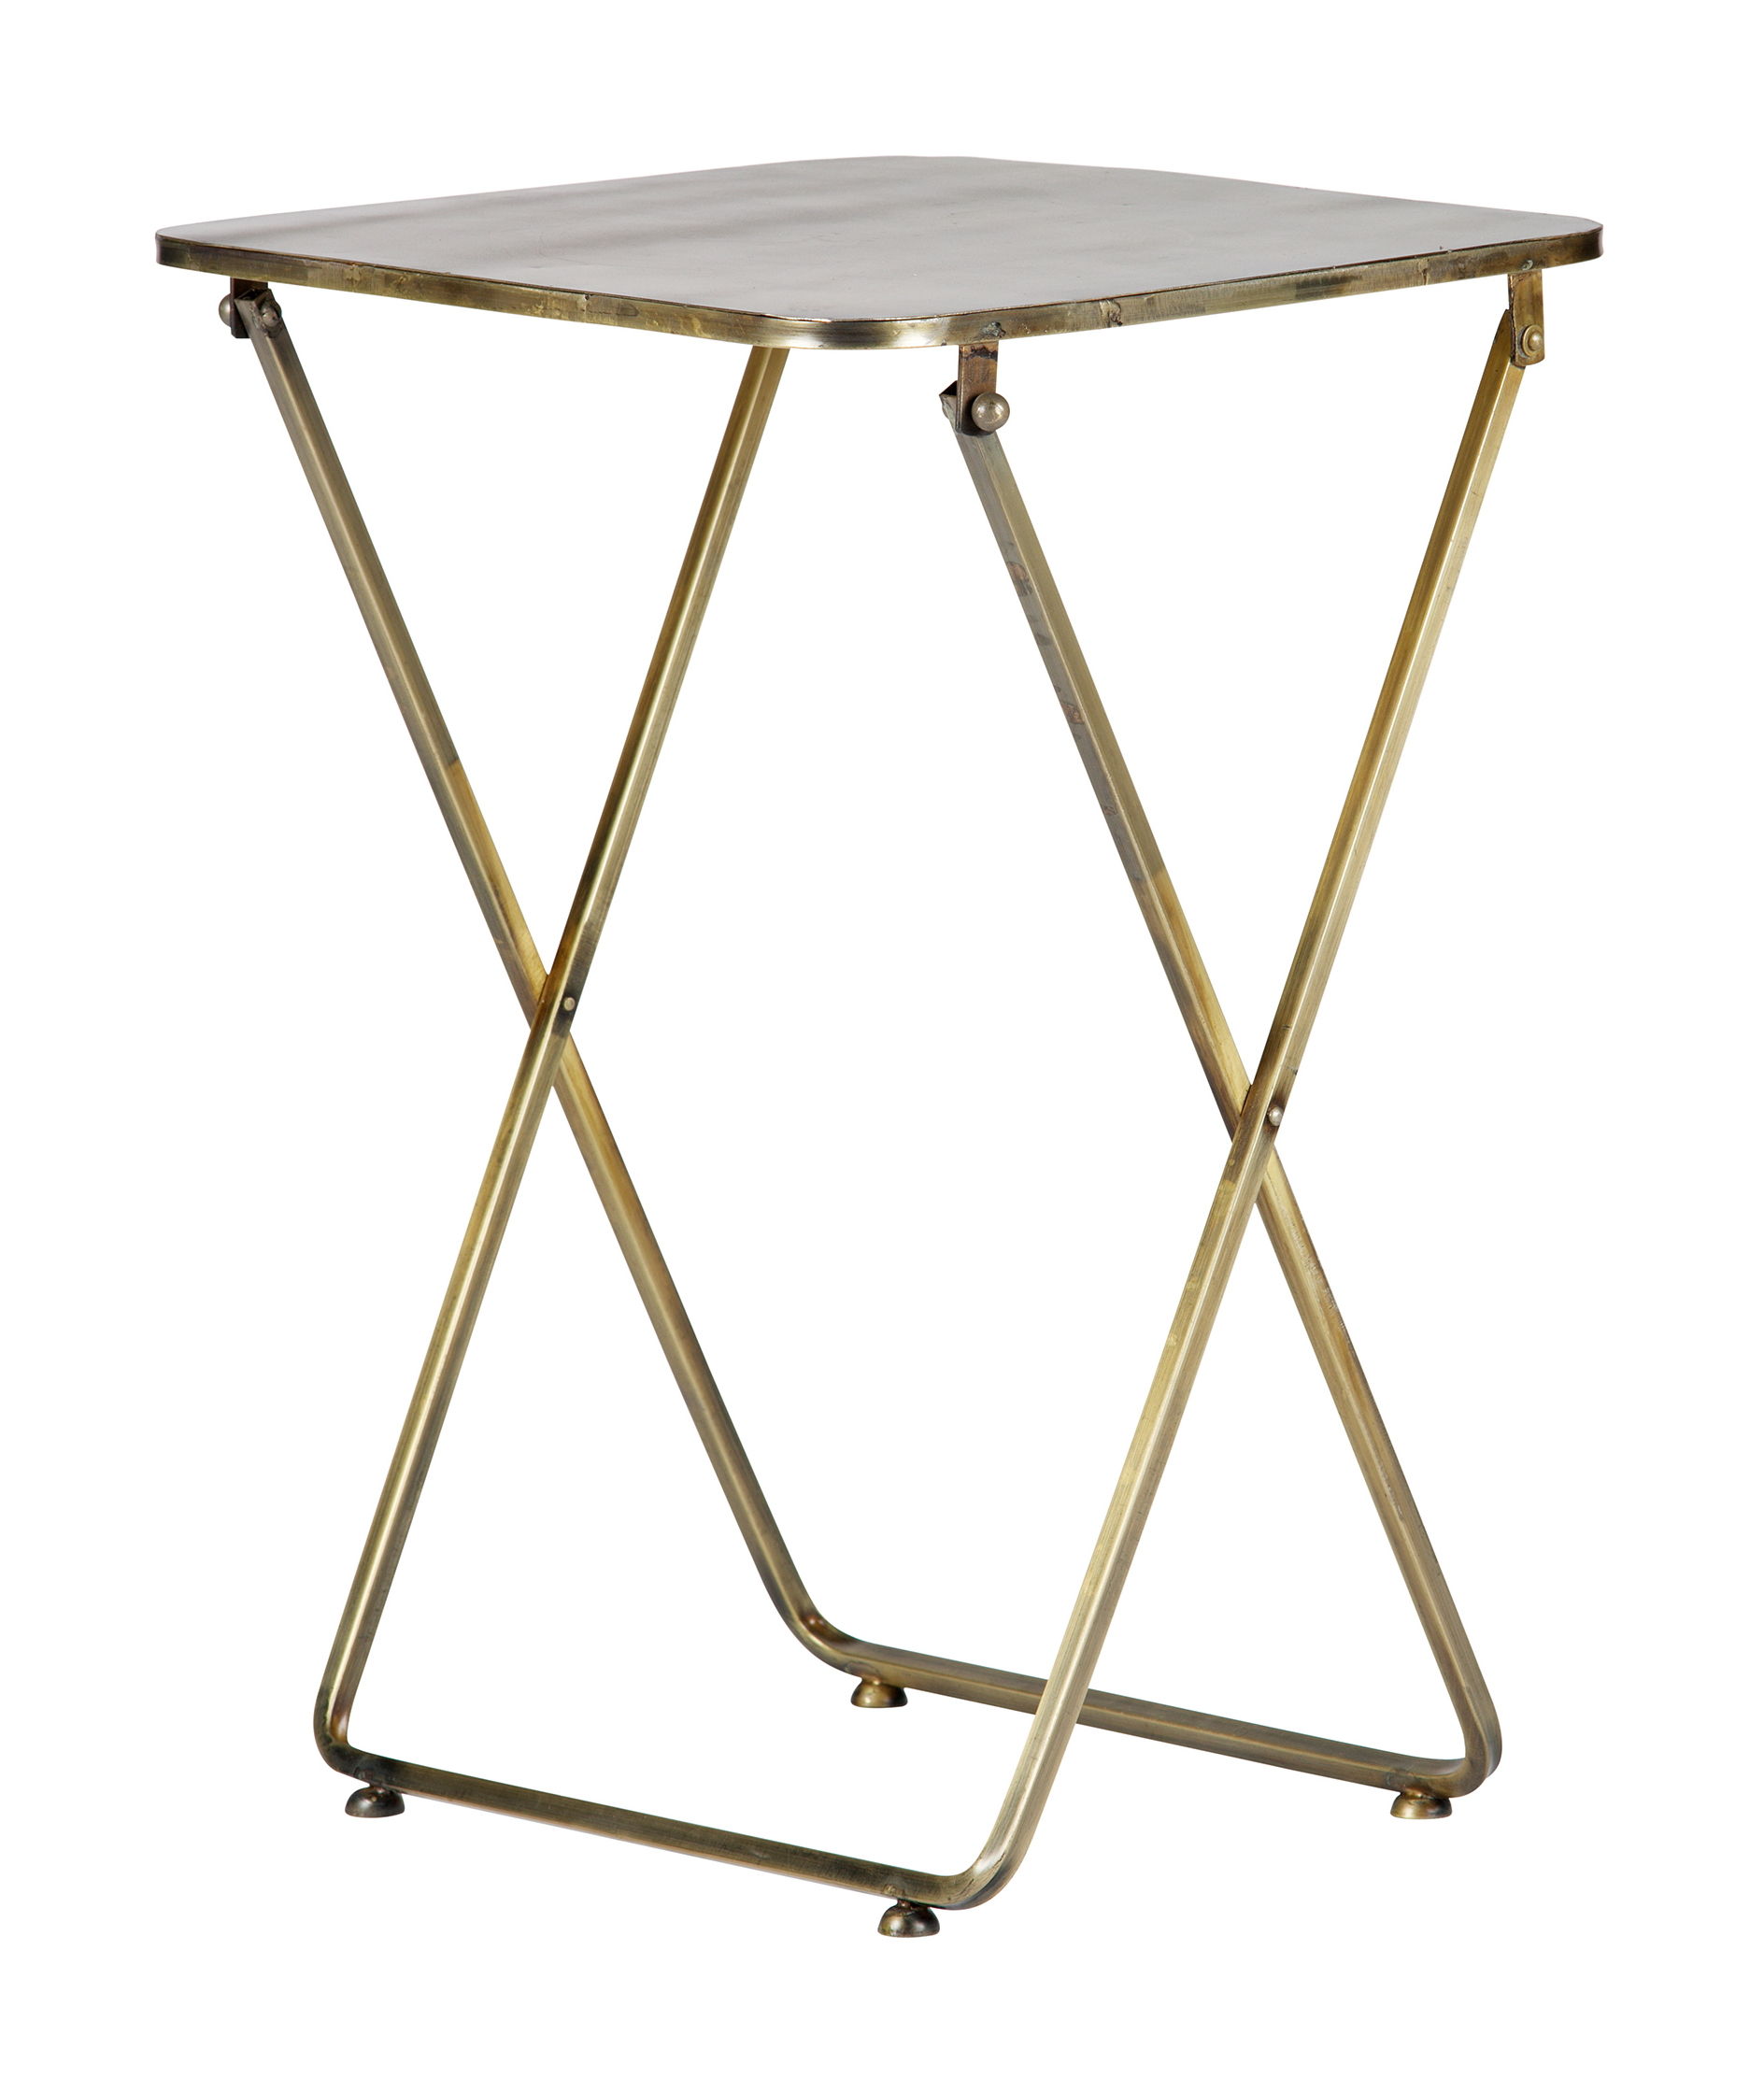 BePureHome Bijzettafel 'Foldaway' 46cm, kleur Antique Brass Tafels | Bijzettafels kopen